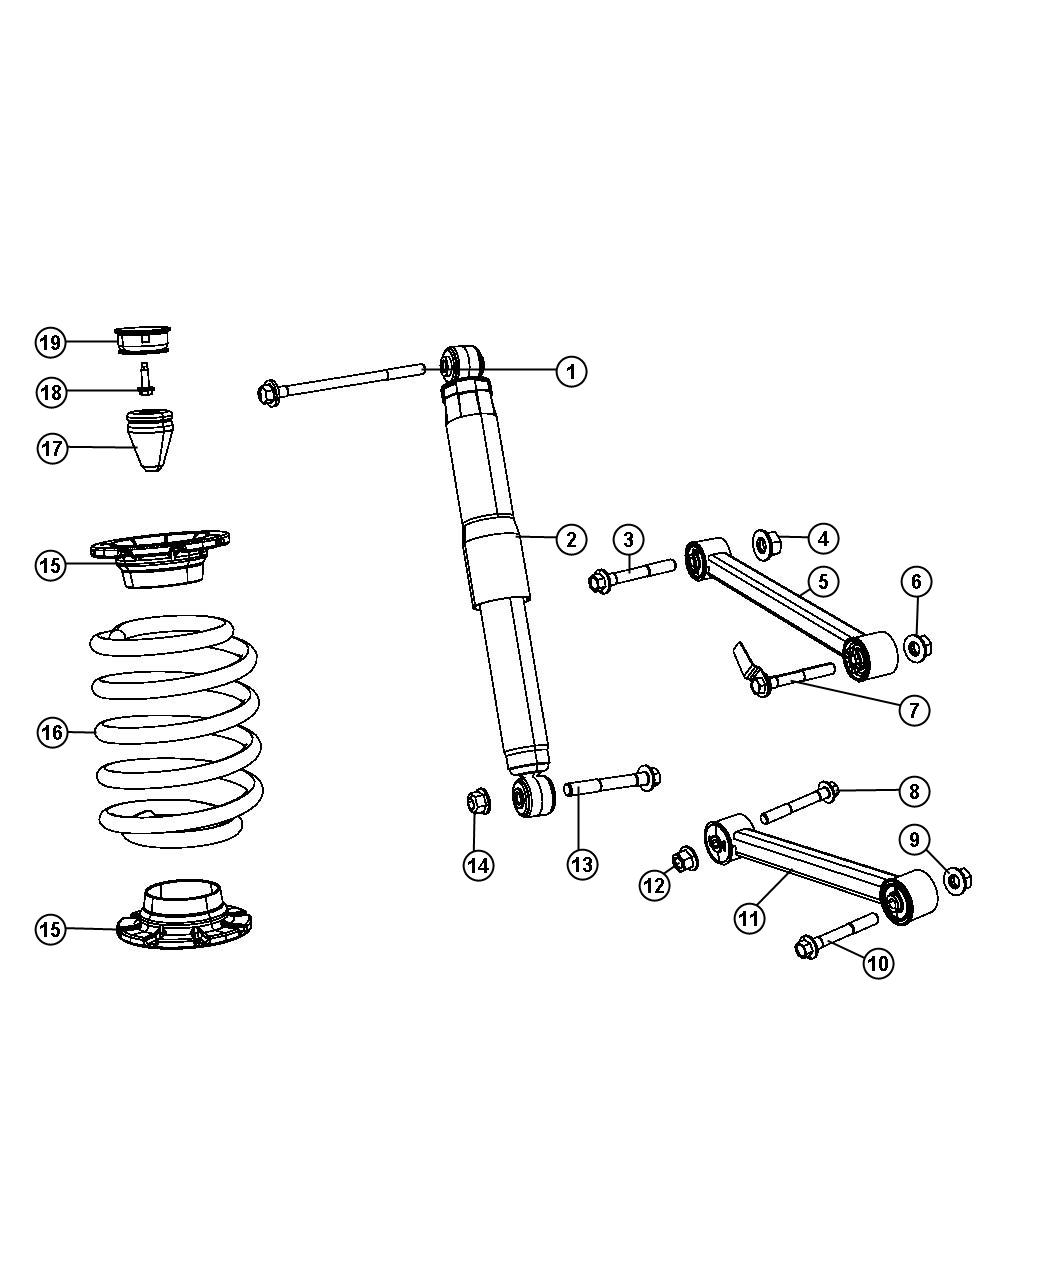 2007 jeep wrangler front suspension diagram wiring for doorbell transformer jk 28 images